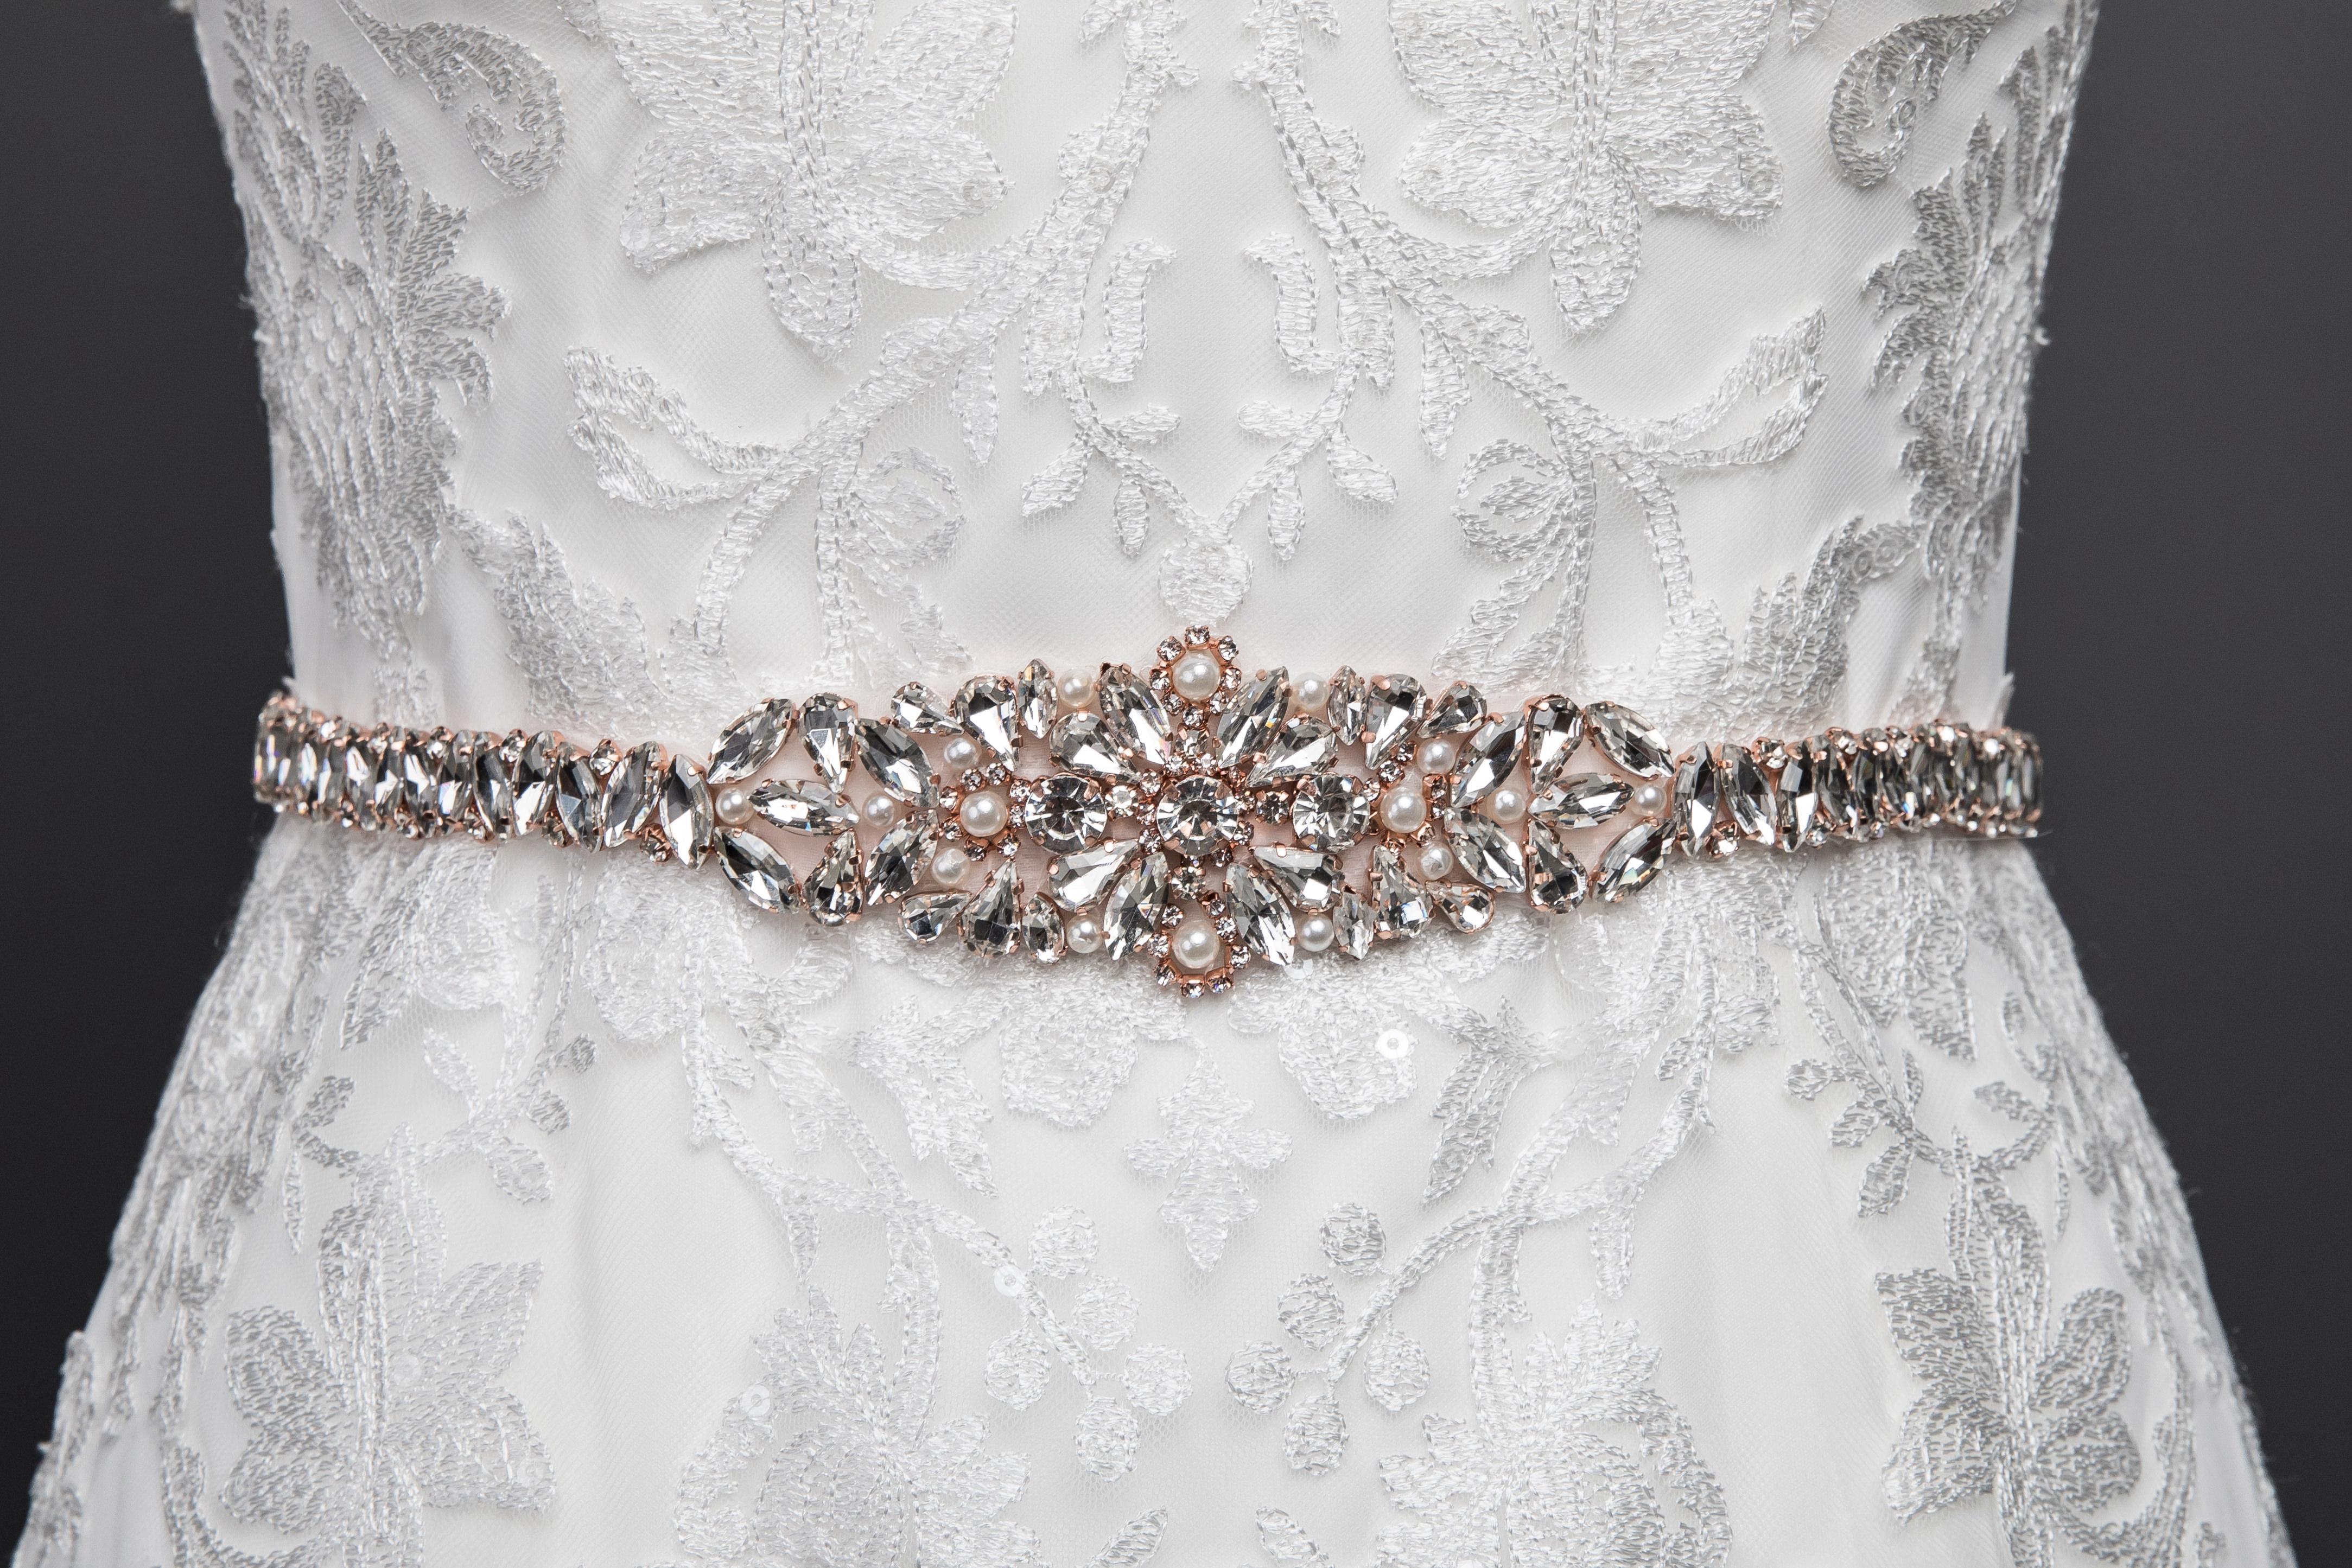 Bridal Classics Belts & Gown Jewellery BELT-56